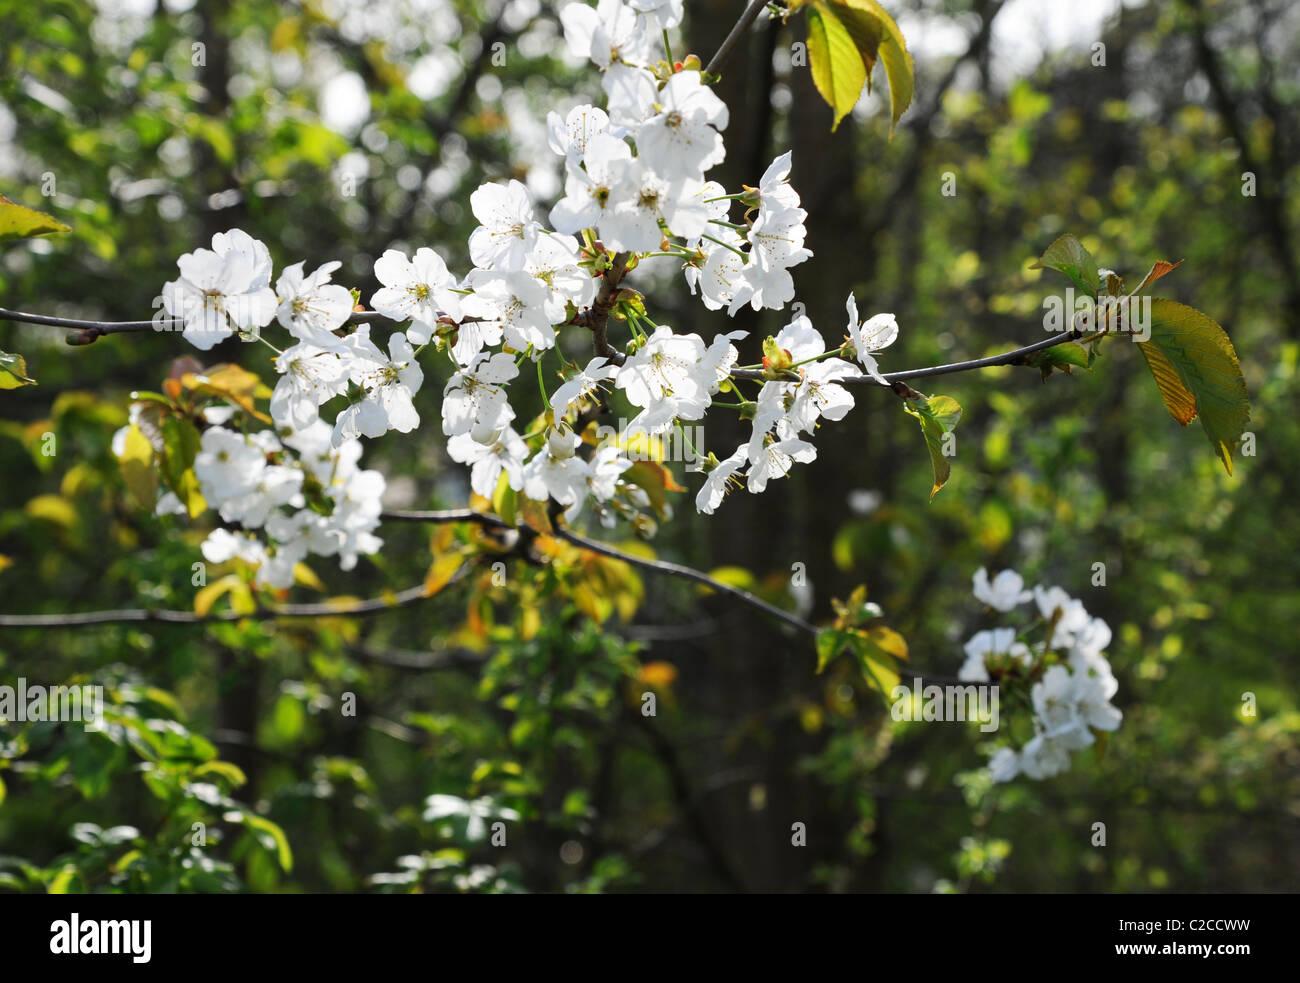 Blossom dappled in spring sunshine - Stock Image